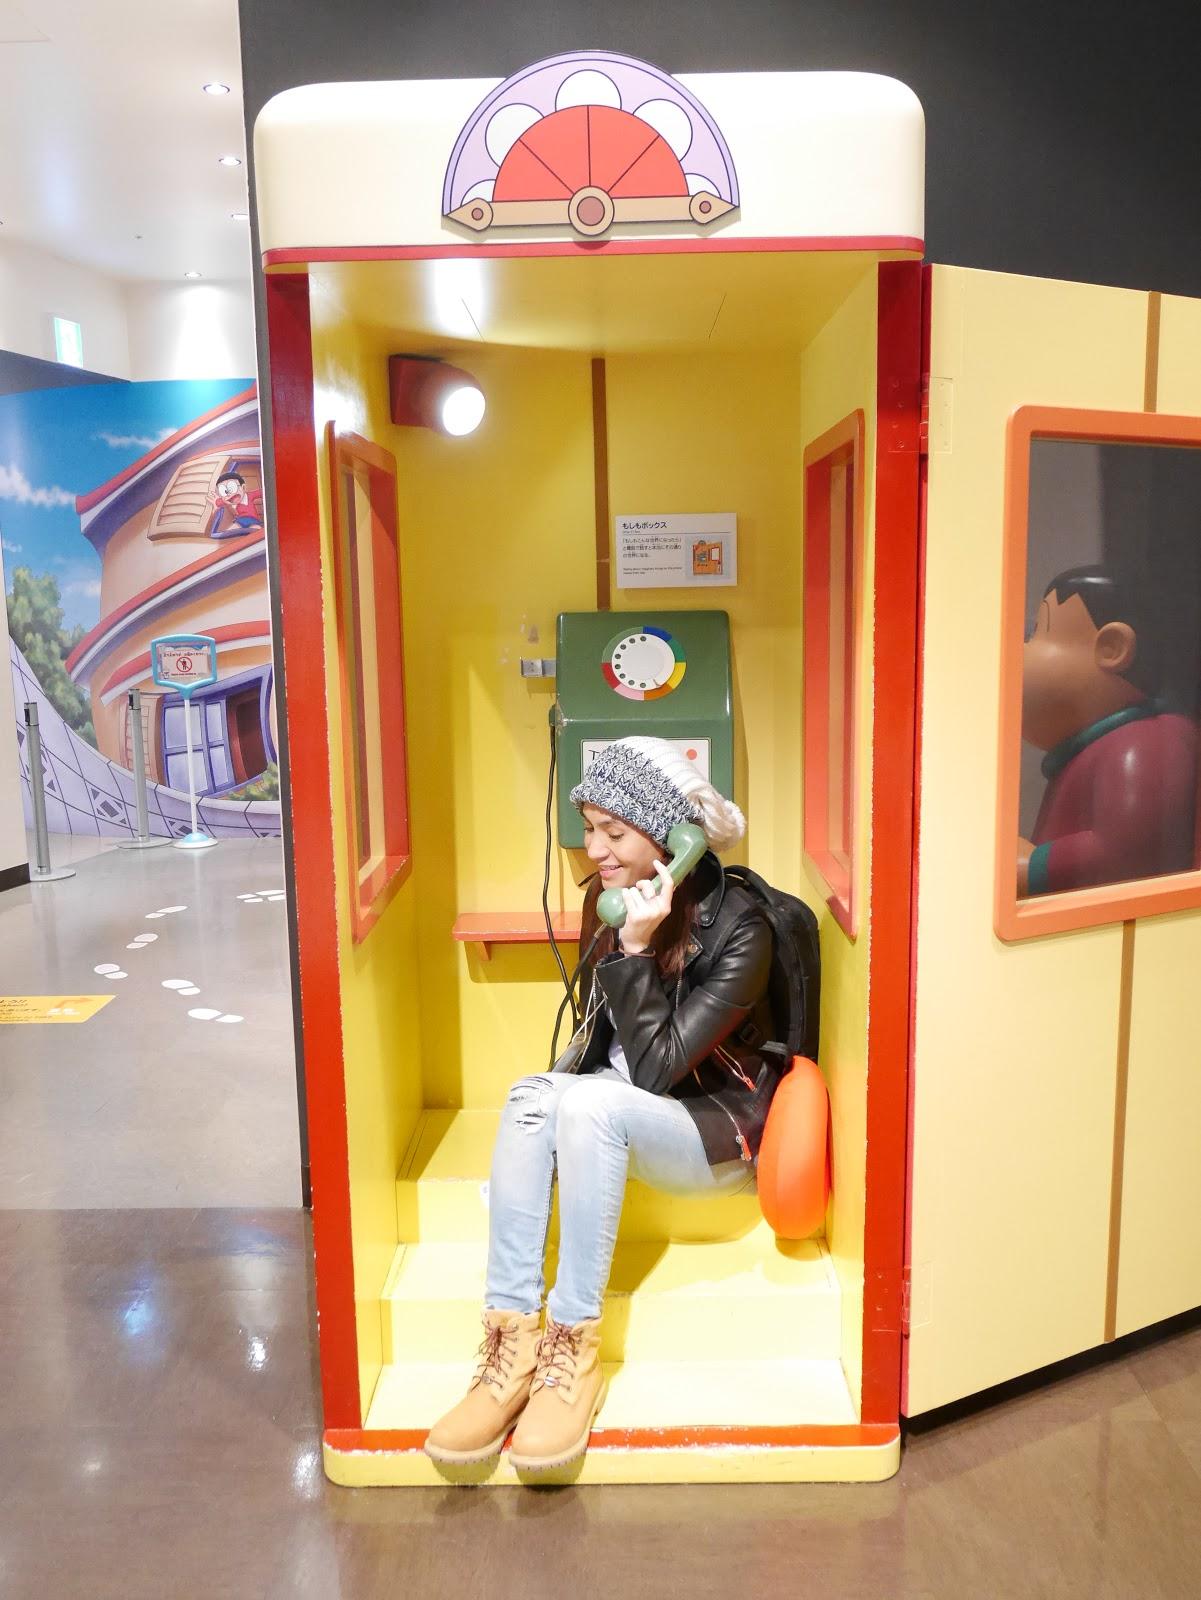 Entry Bergambar Hokkaido Day 1 Media Panas Tcash Vaganza 18 Nabi Matte Long Lasting Lip Gloss Semua Mak Orang Bapak Masing2 Sasau Jadi Kanak2 Riang Lupa Nak Sebut Kitorang Pergi 4 Kak Filla Ujang Jocko And Meeeee